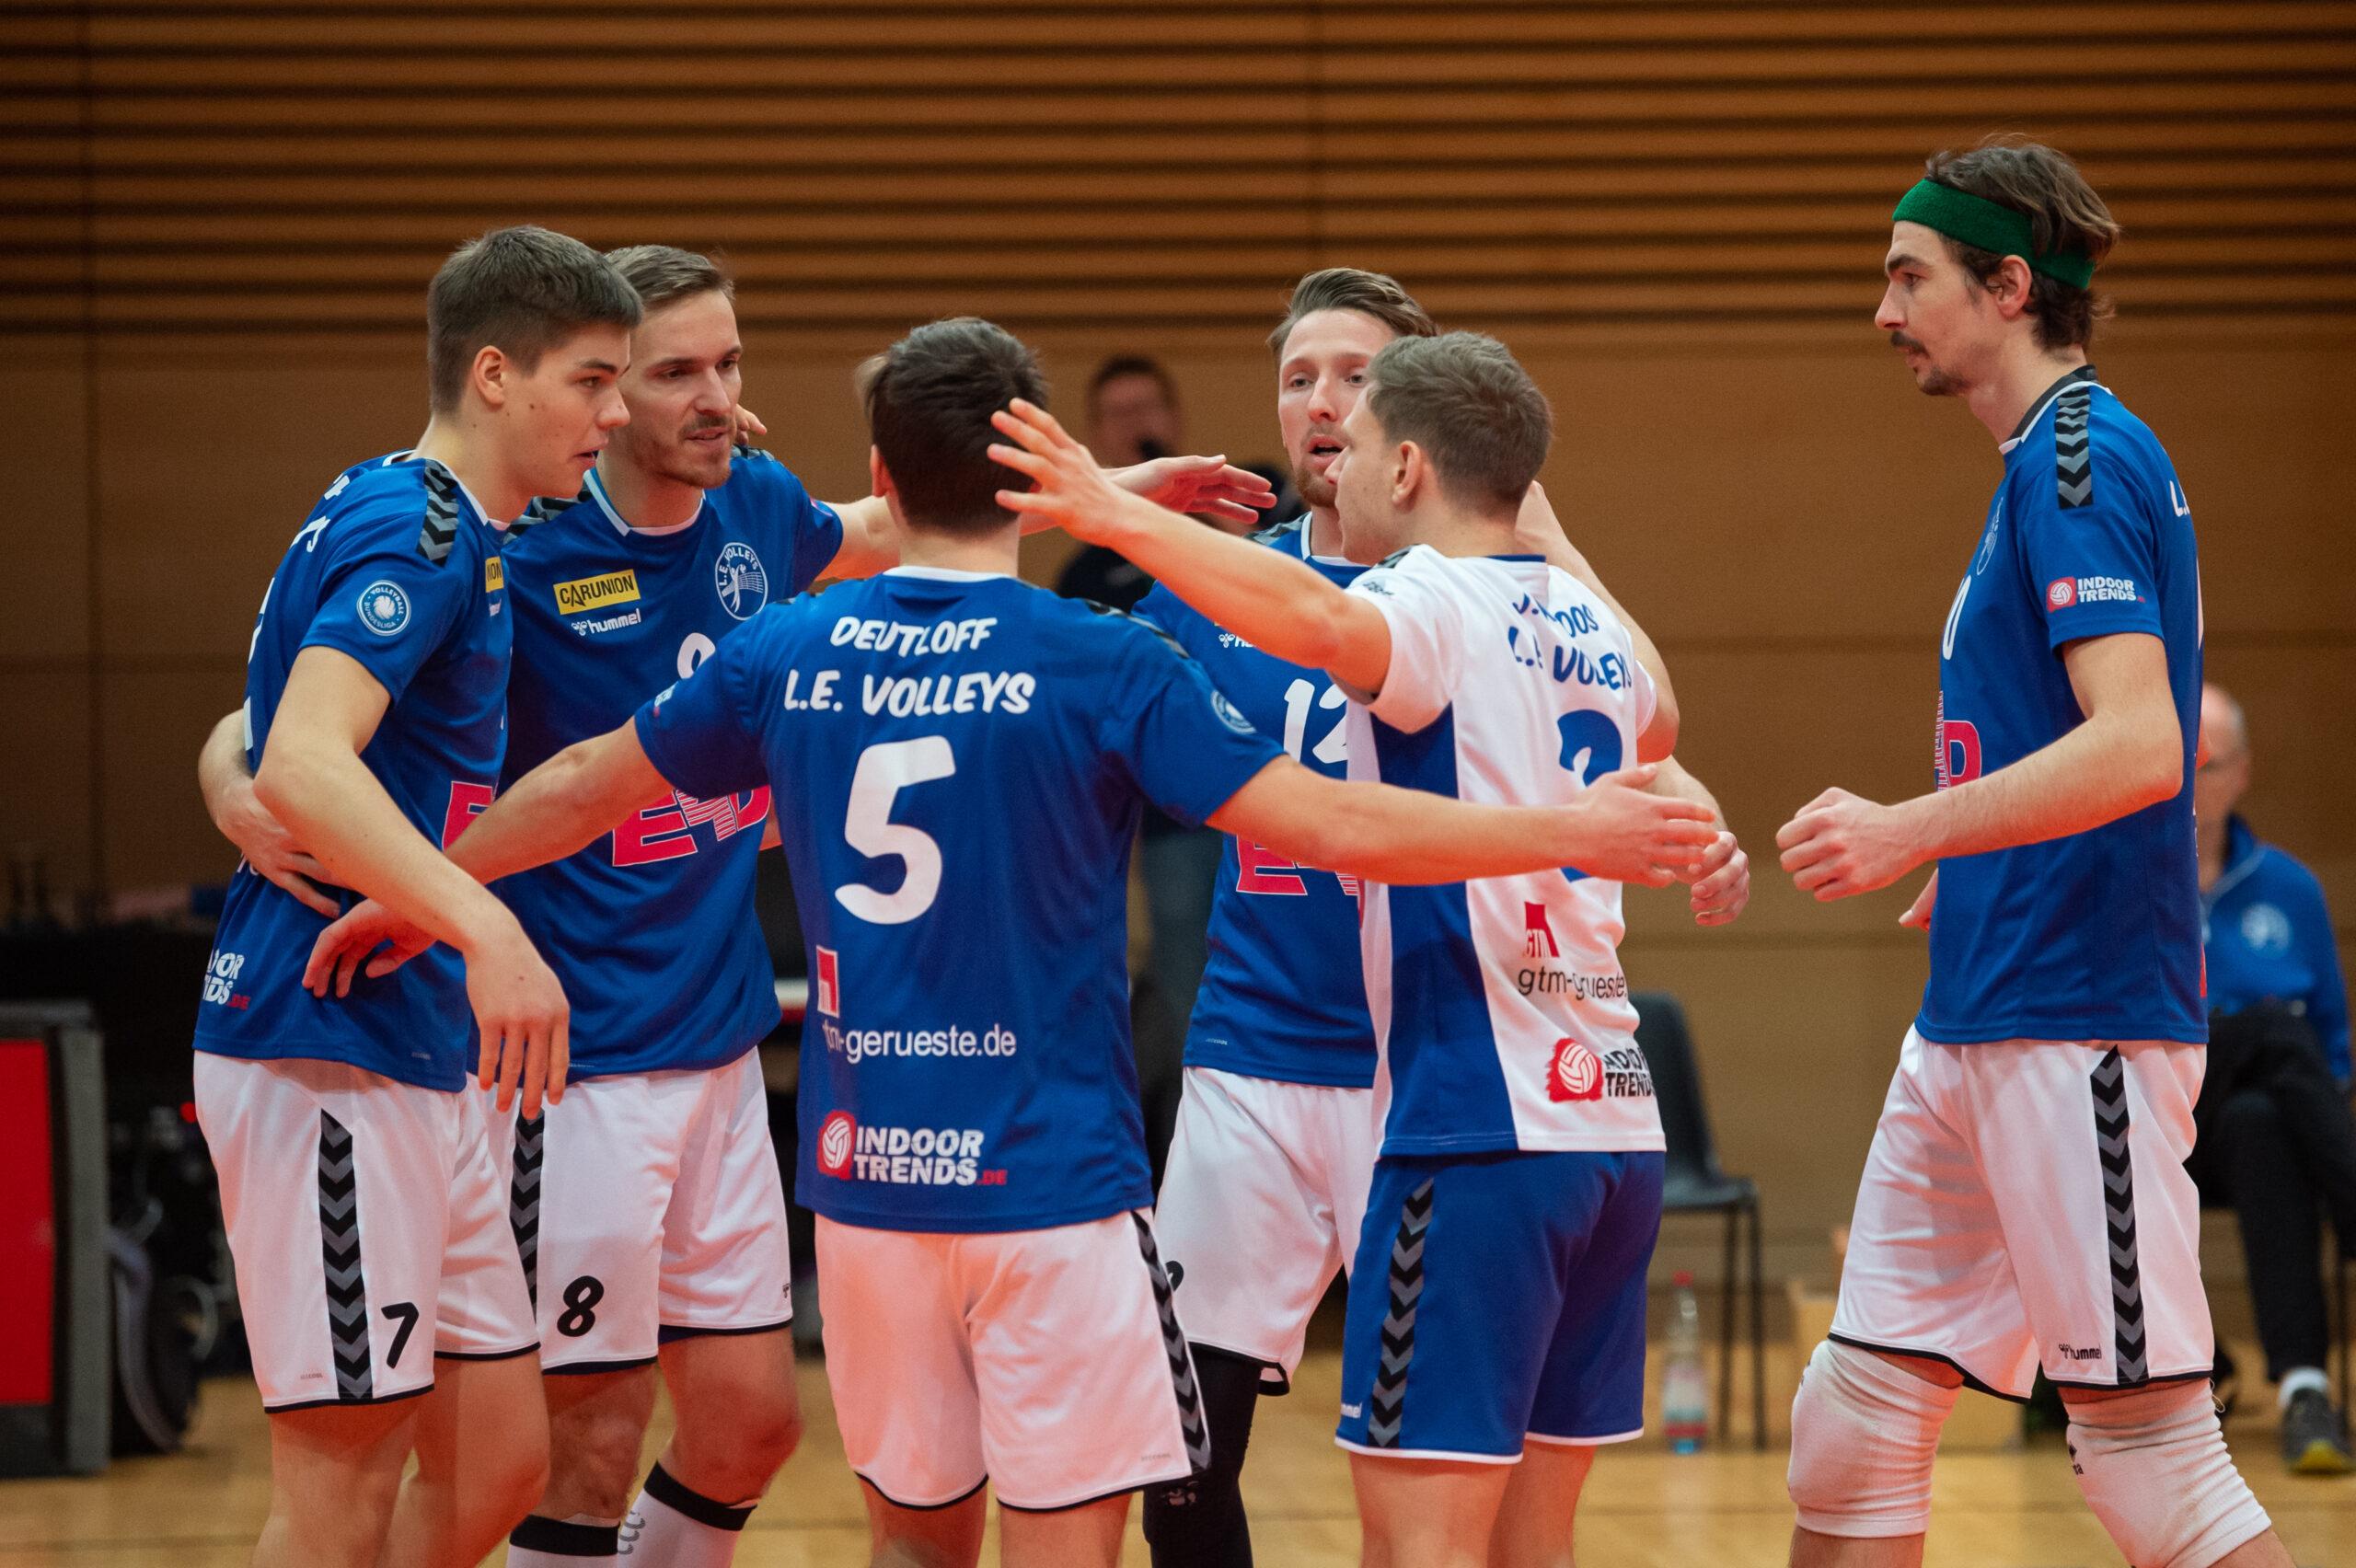 Jannik Koßmann (Volleys 7), Chris Warsawski (Volleys 8), Lorenz Deutloff (Volleys 5), Martin  Burgartz (Volleys 12), Niklas Karoos (Volleys 3), Richard Rocktäschel (Volleys 1) (l-r)   L.E. Volleys Leipzig vs Volley Youngstars Friedrichshafen, Volleyball, 2.Liga, 12.12.2020